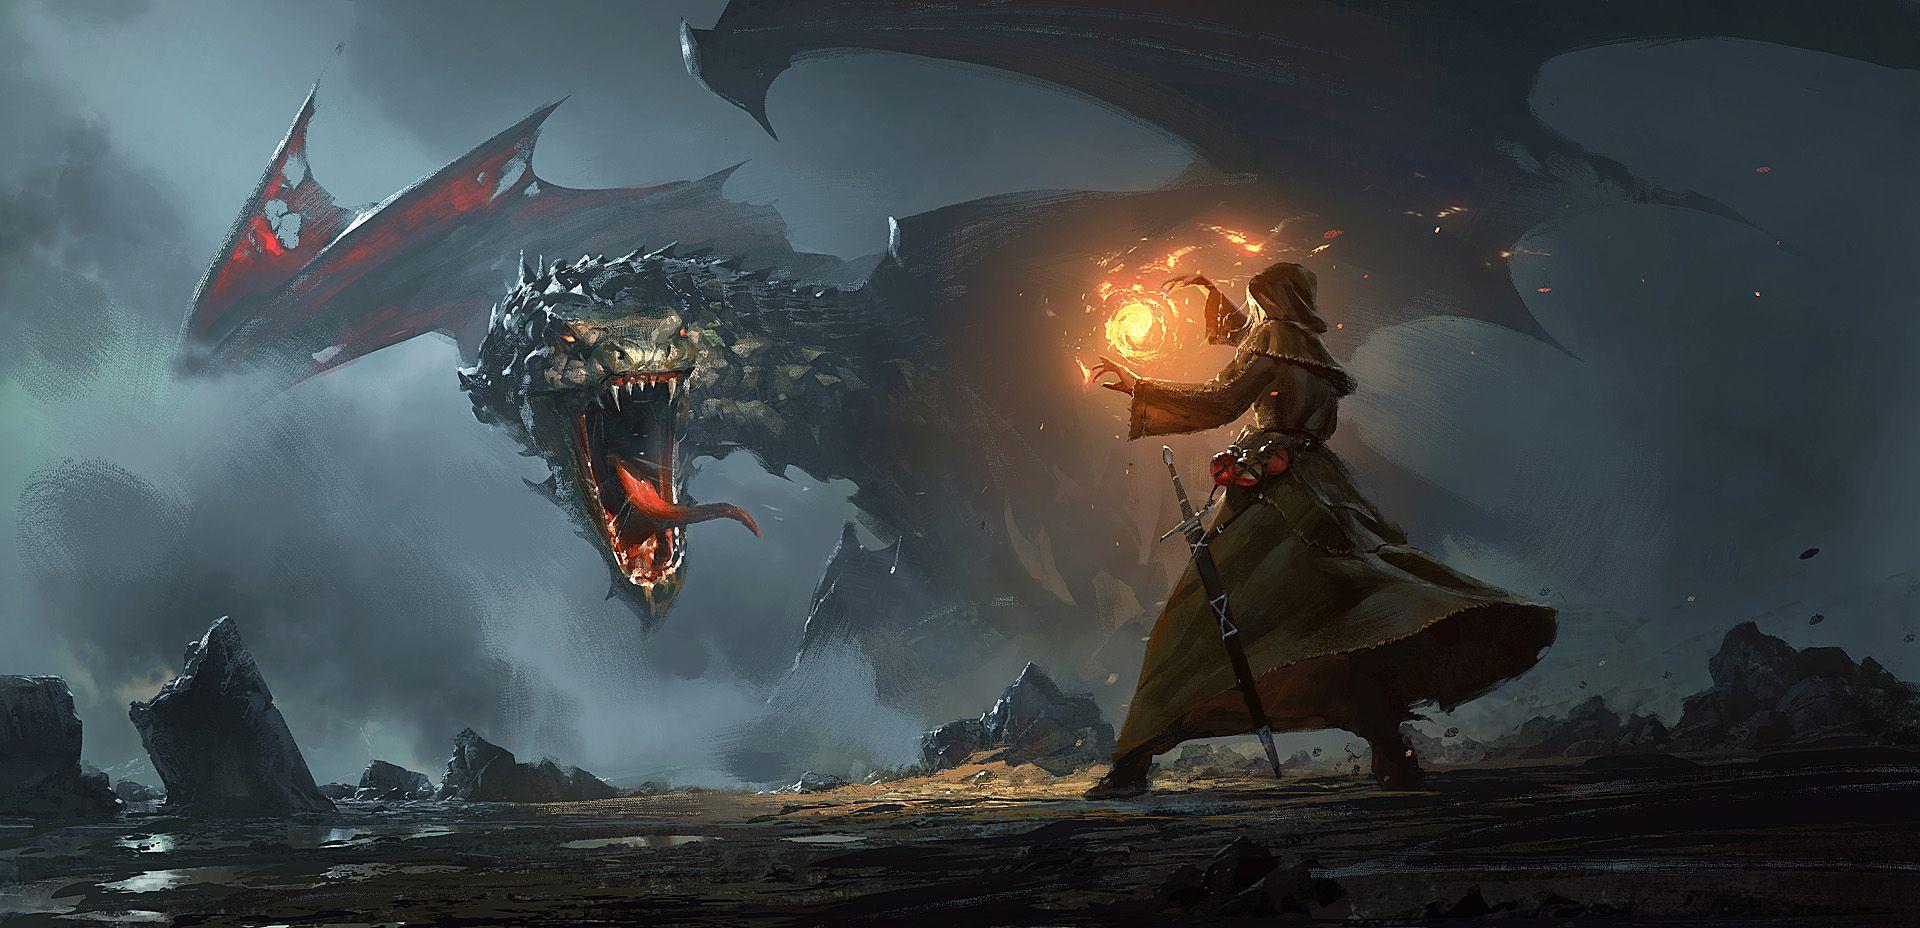 Desktop Wallpaper Fantasy, Wizard, Dragon, Fight, Art, Hd